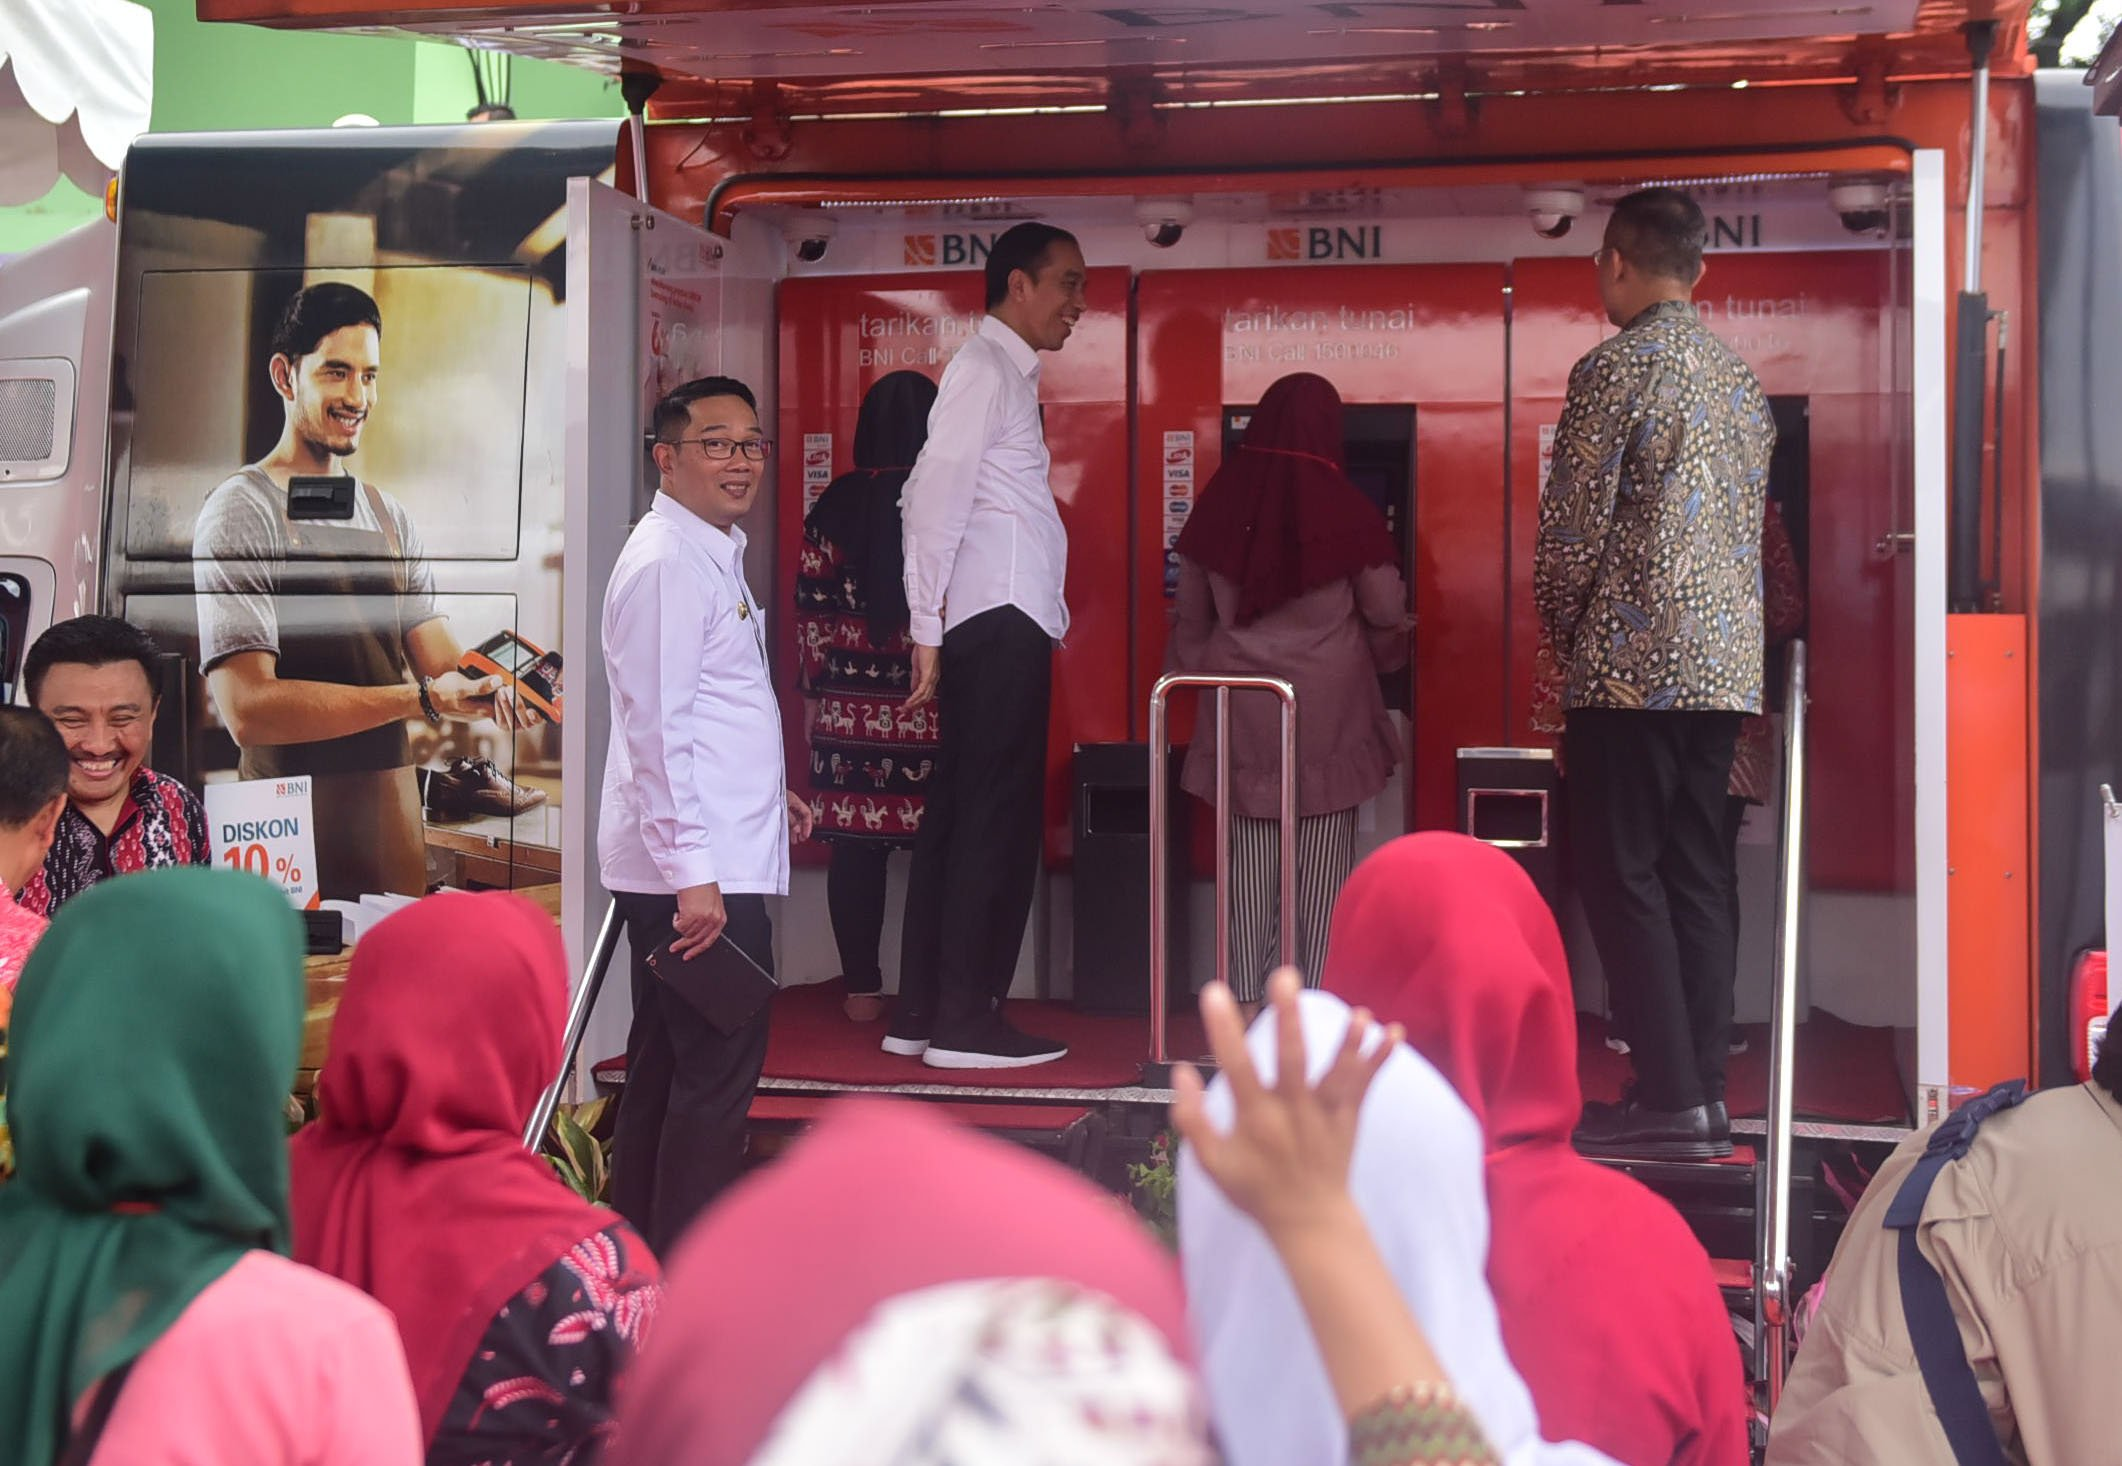 Serahkan PKH di Cimahi, Presiden Janji Akan Dampingi Mekaar hingga Ingatkan Gizi Anak Diperhatikan 114